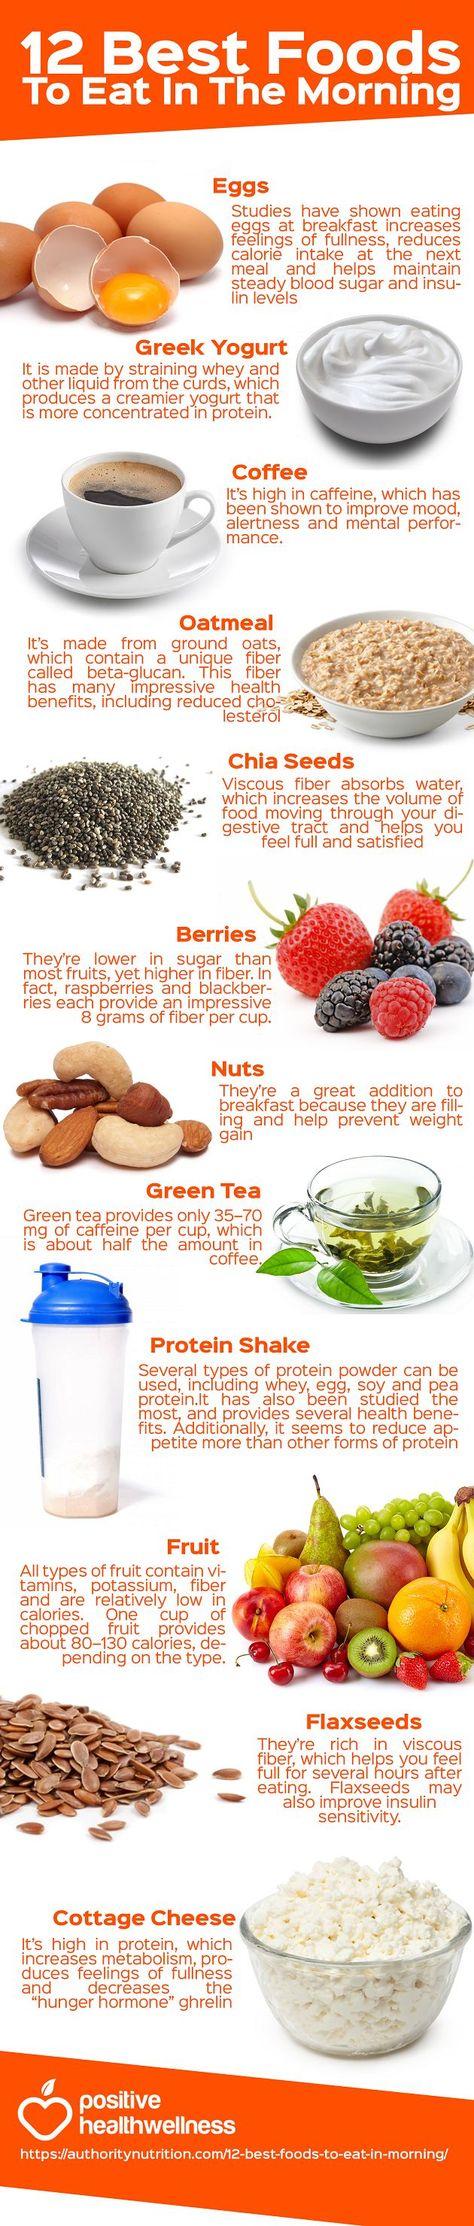 12 Healthy Foods for Breakfast.jpg